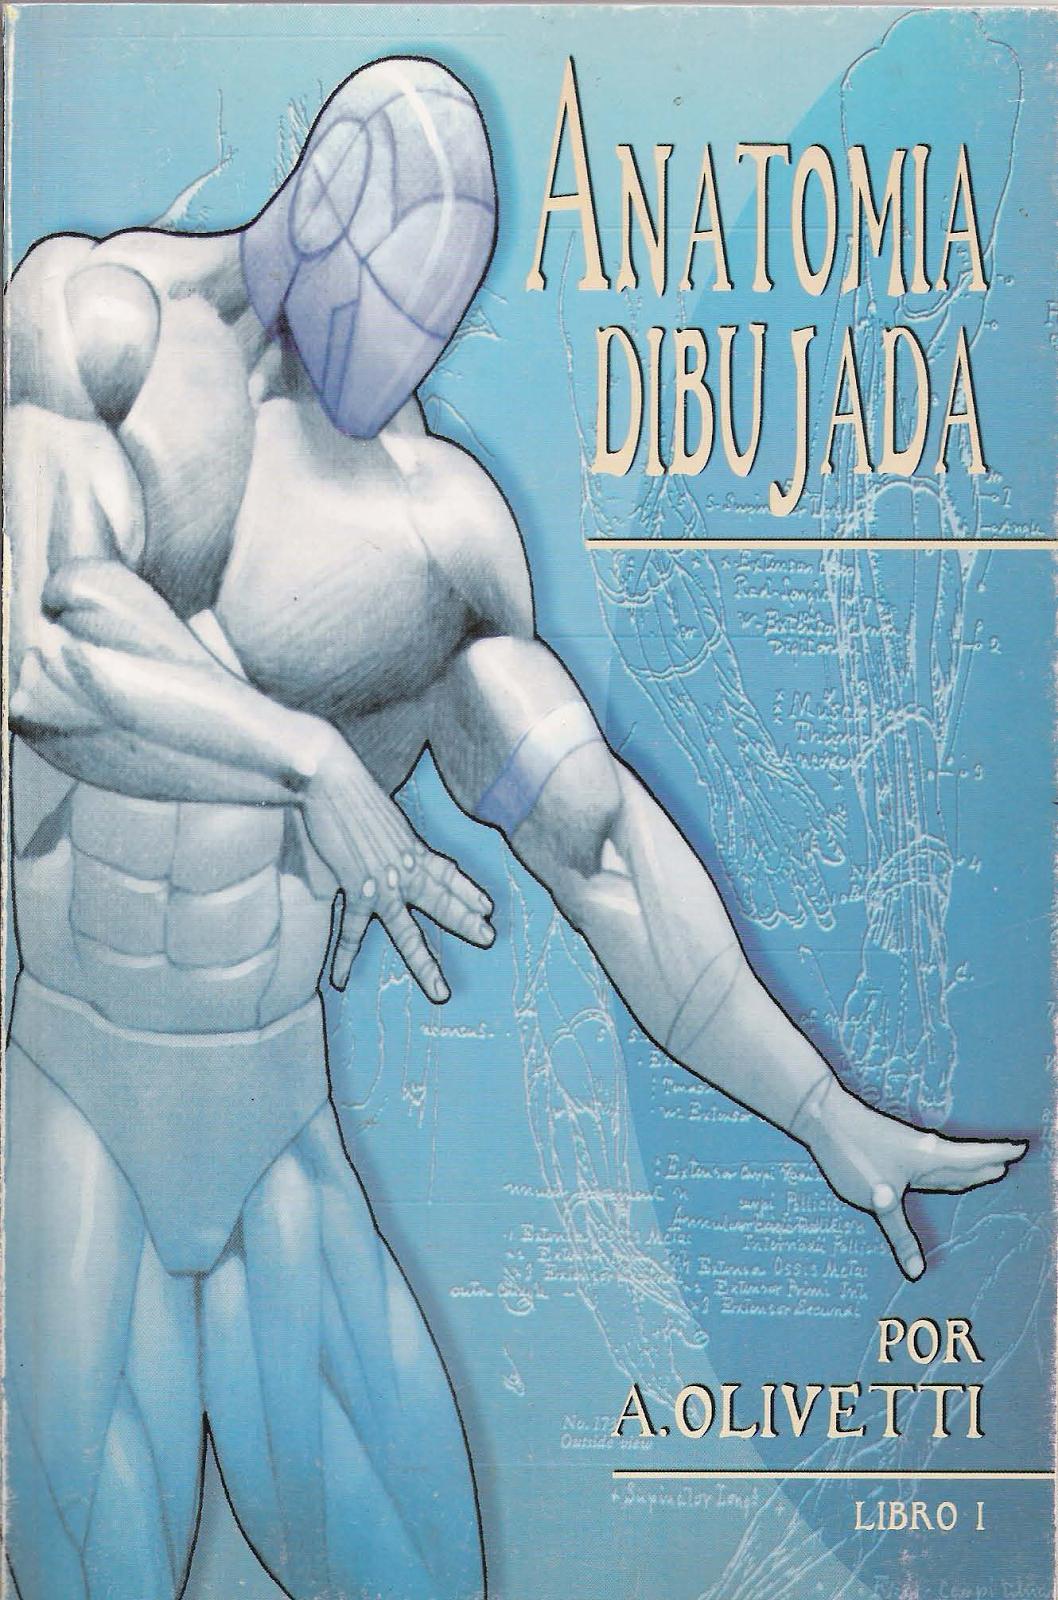 Sheigon Art: Descarga Anatomía Dibujada - Ariel Olivetti